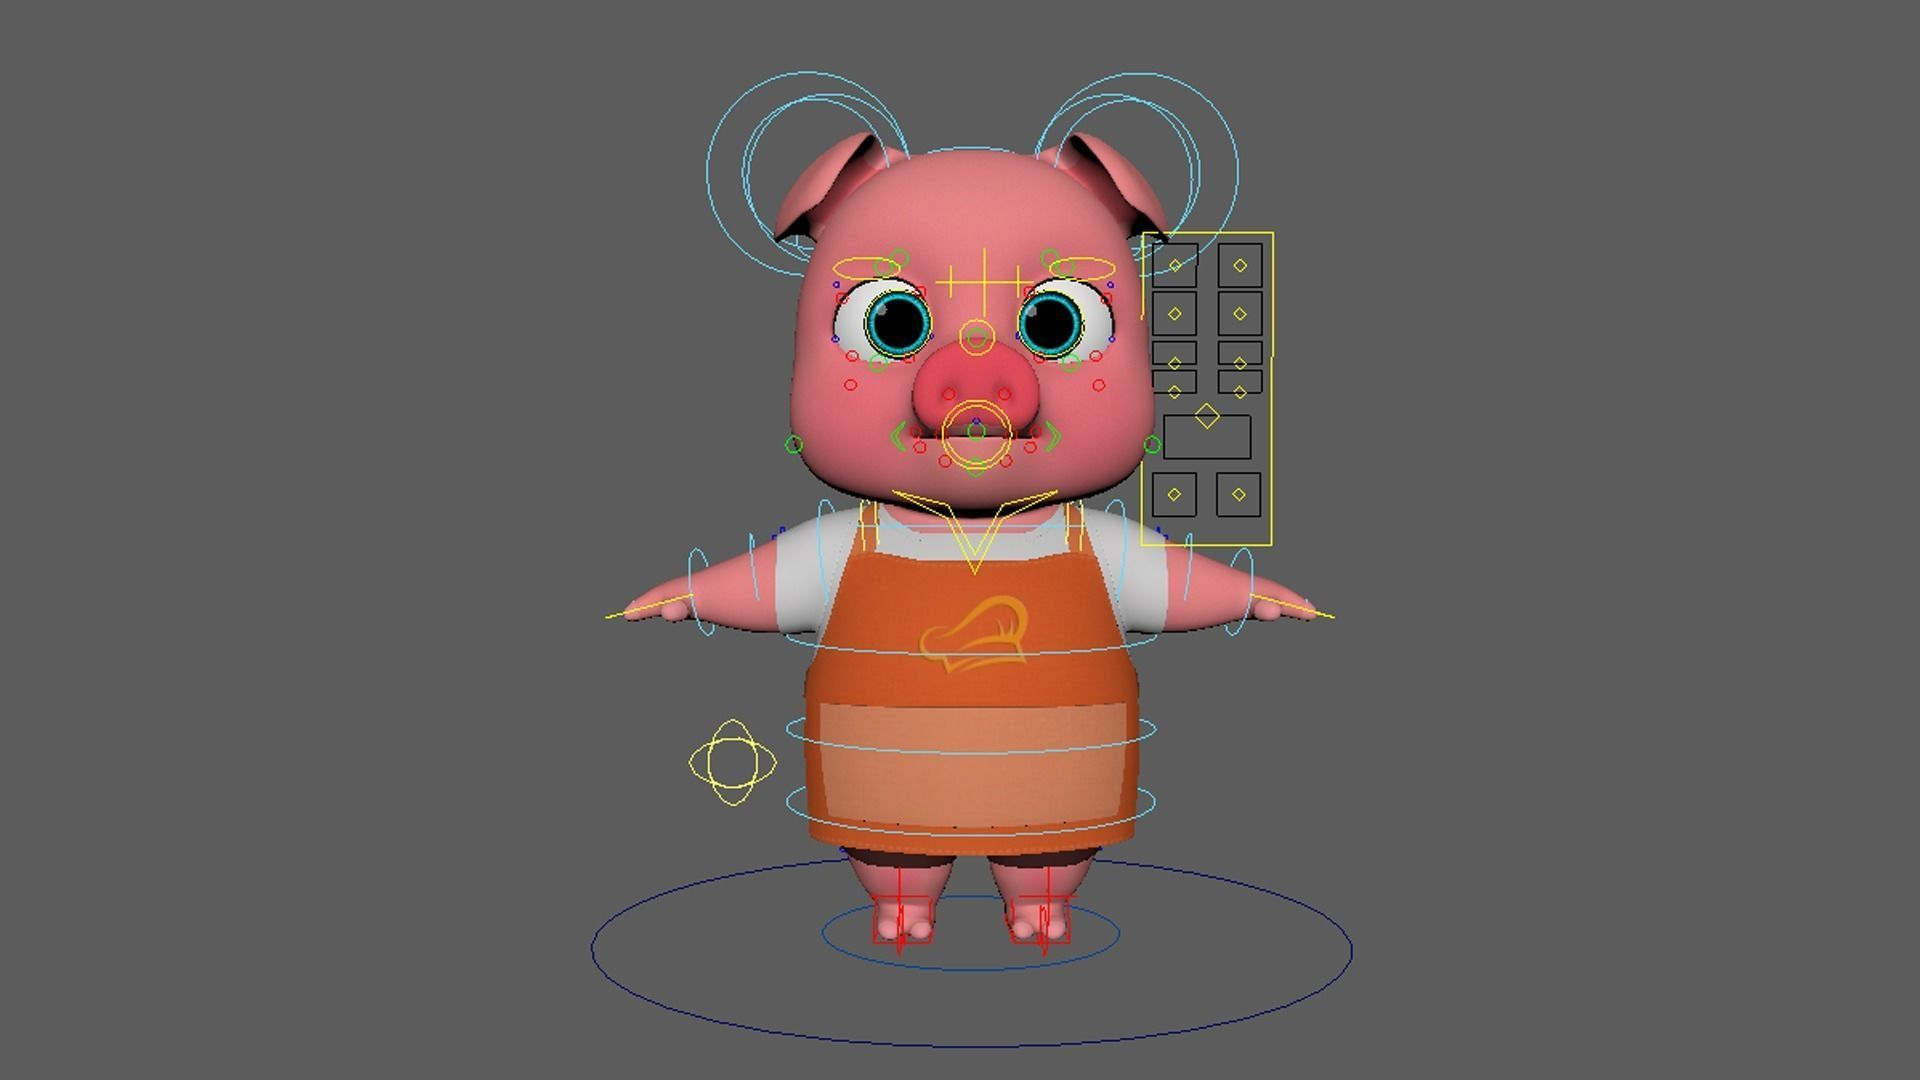 Asset - Cartoons - Animal - Pig - Rig